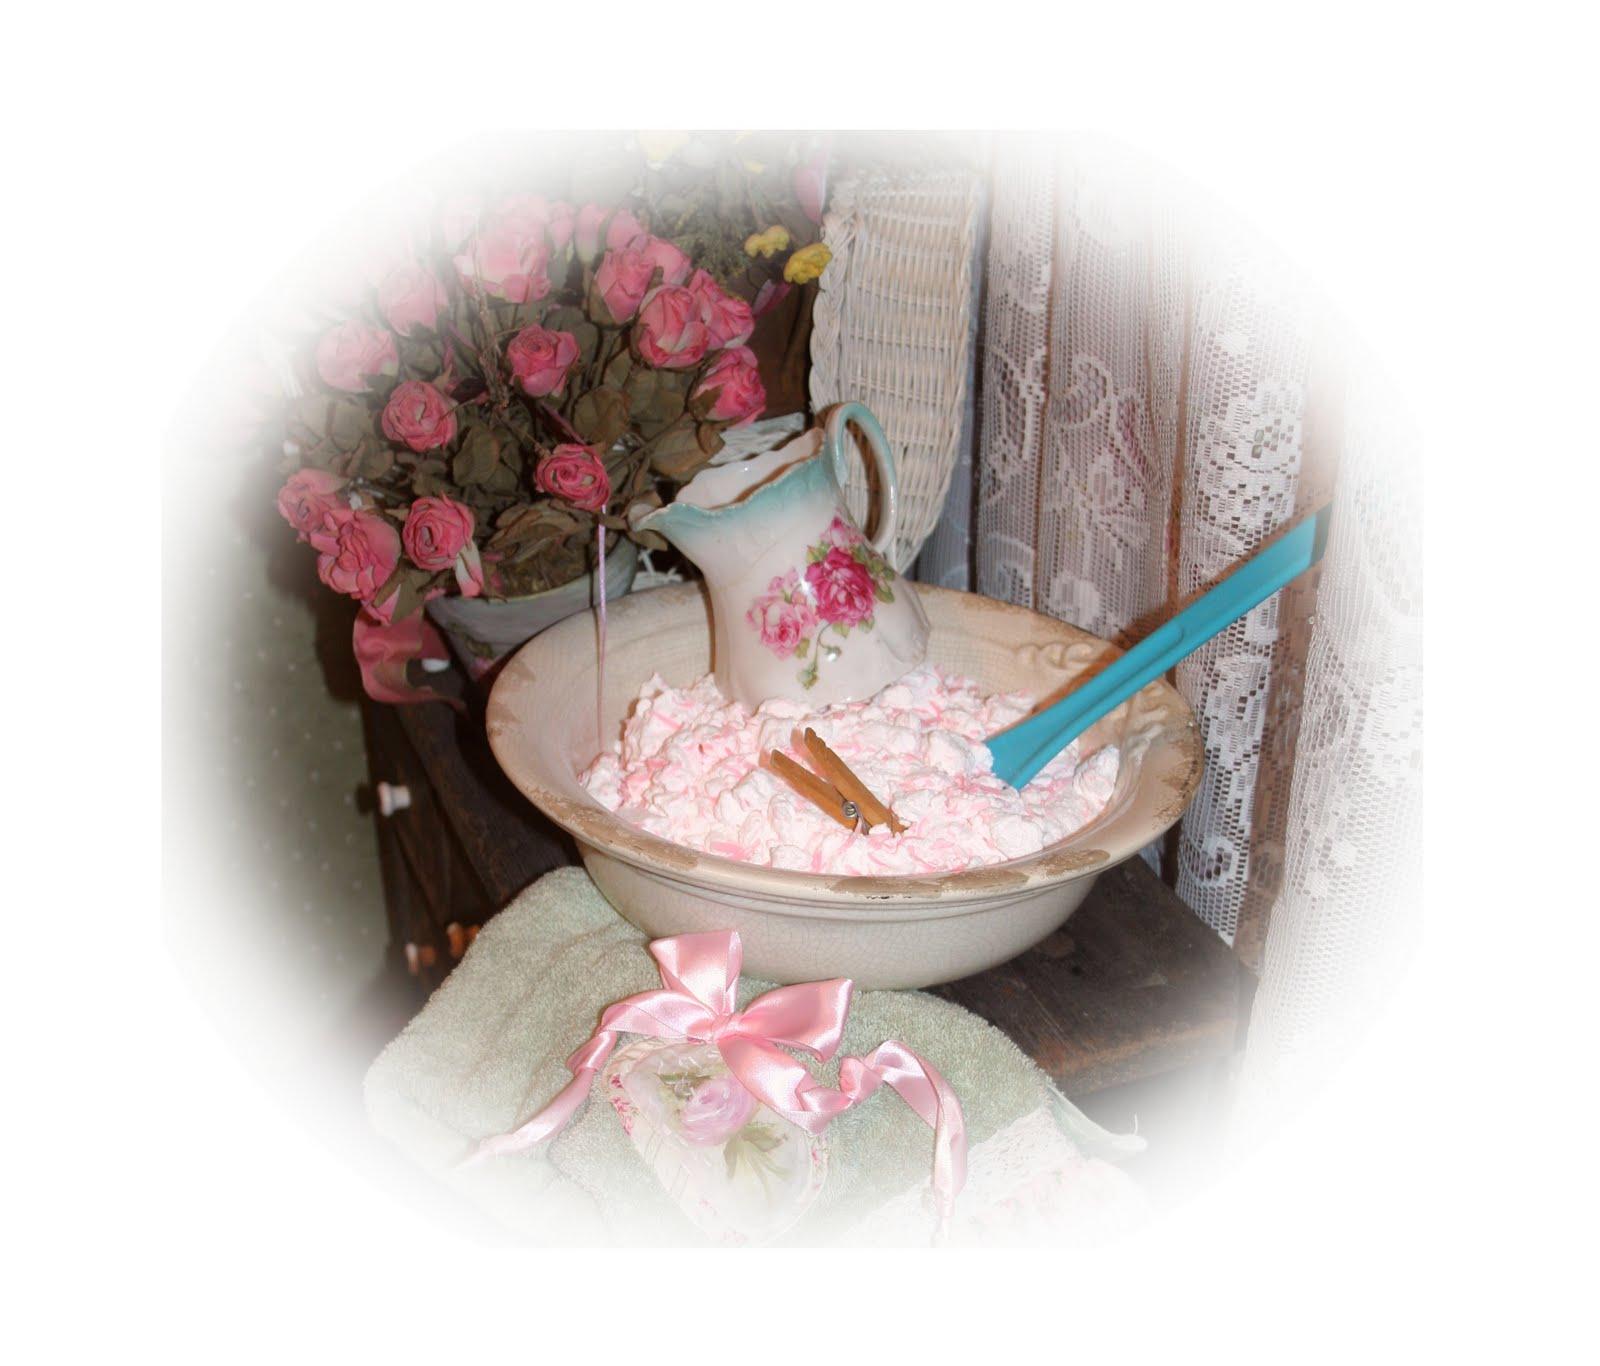 Quaker Hill Farm Pretty Pink Homemade Laundry Soap